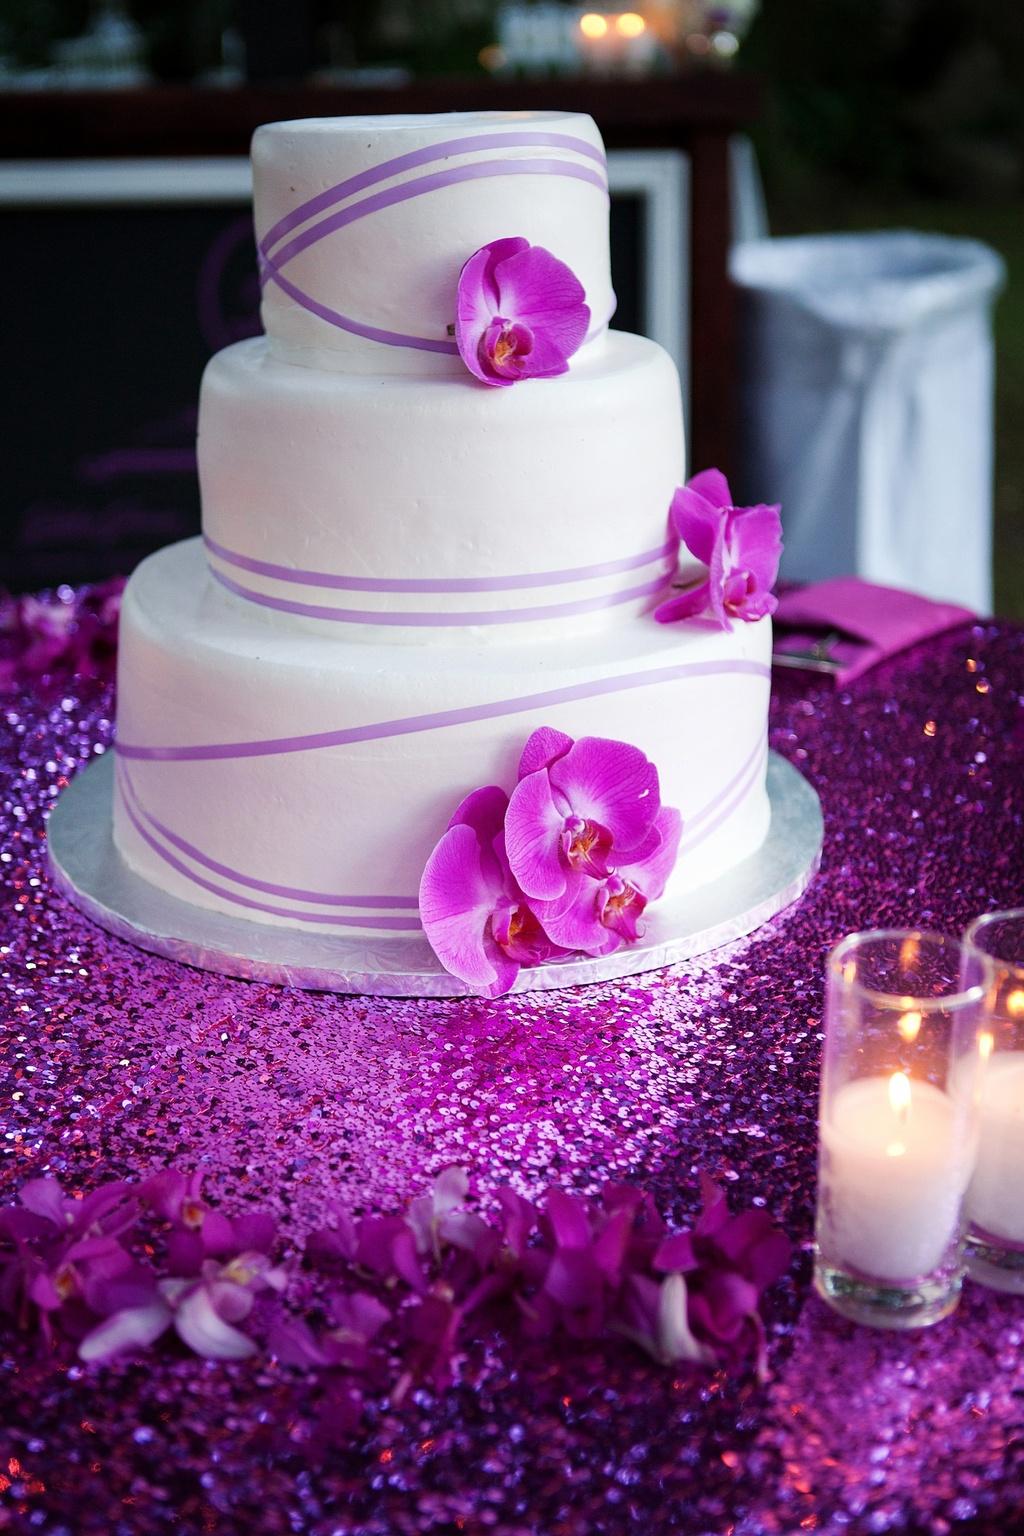 Elegant-winery-wedding-in-malibu-classic-wedding-cake-with-fuschia-orchids.full